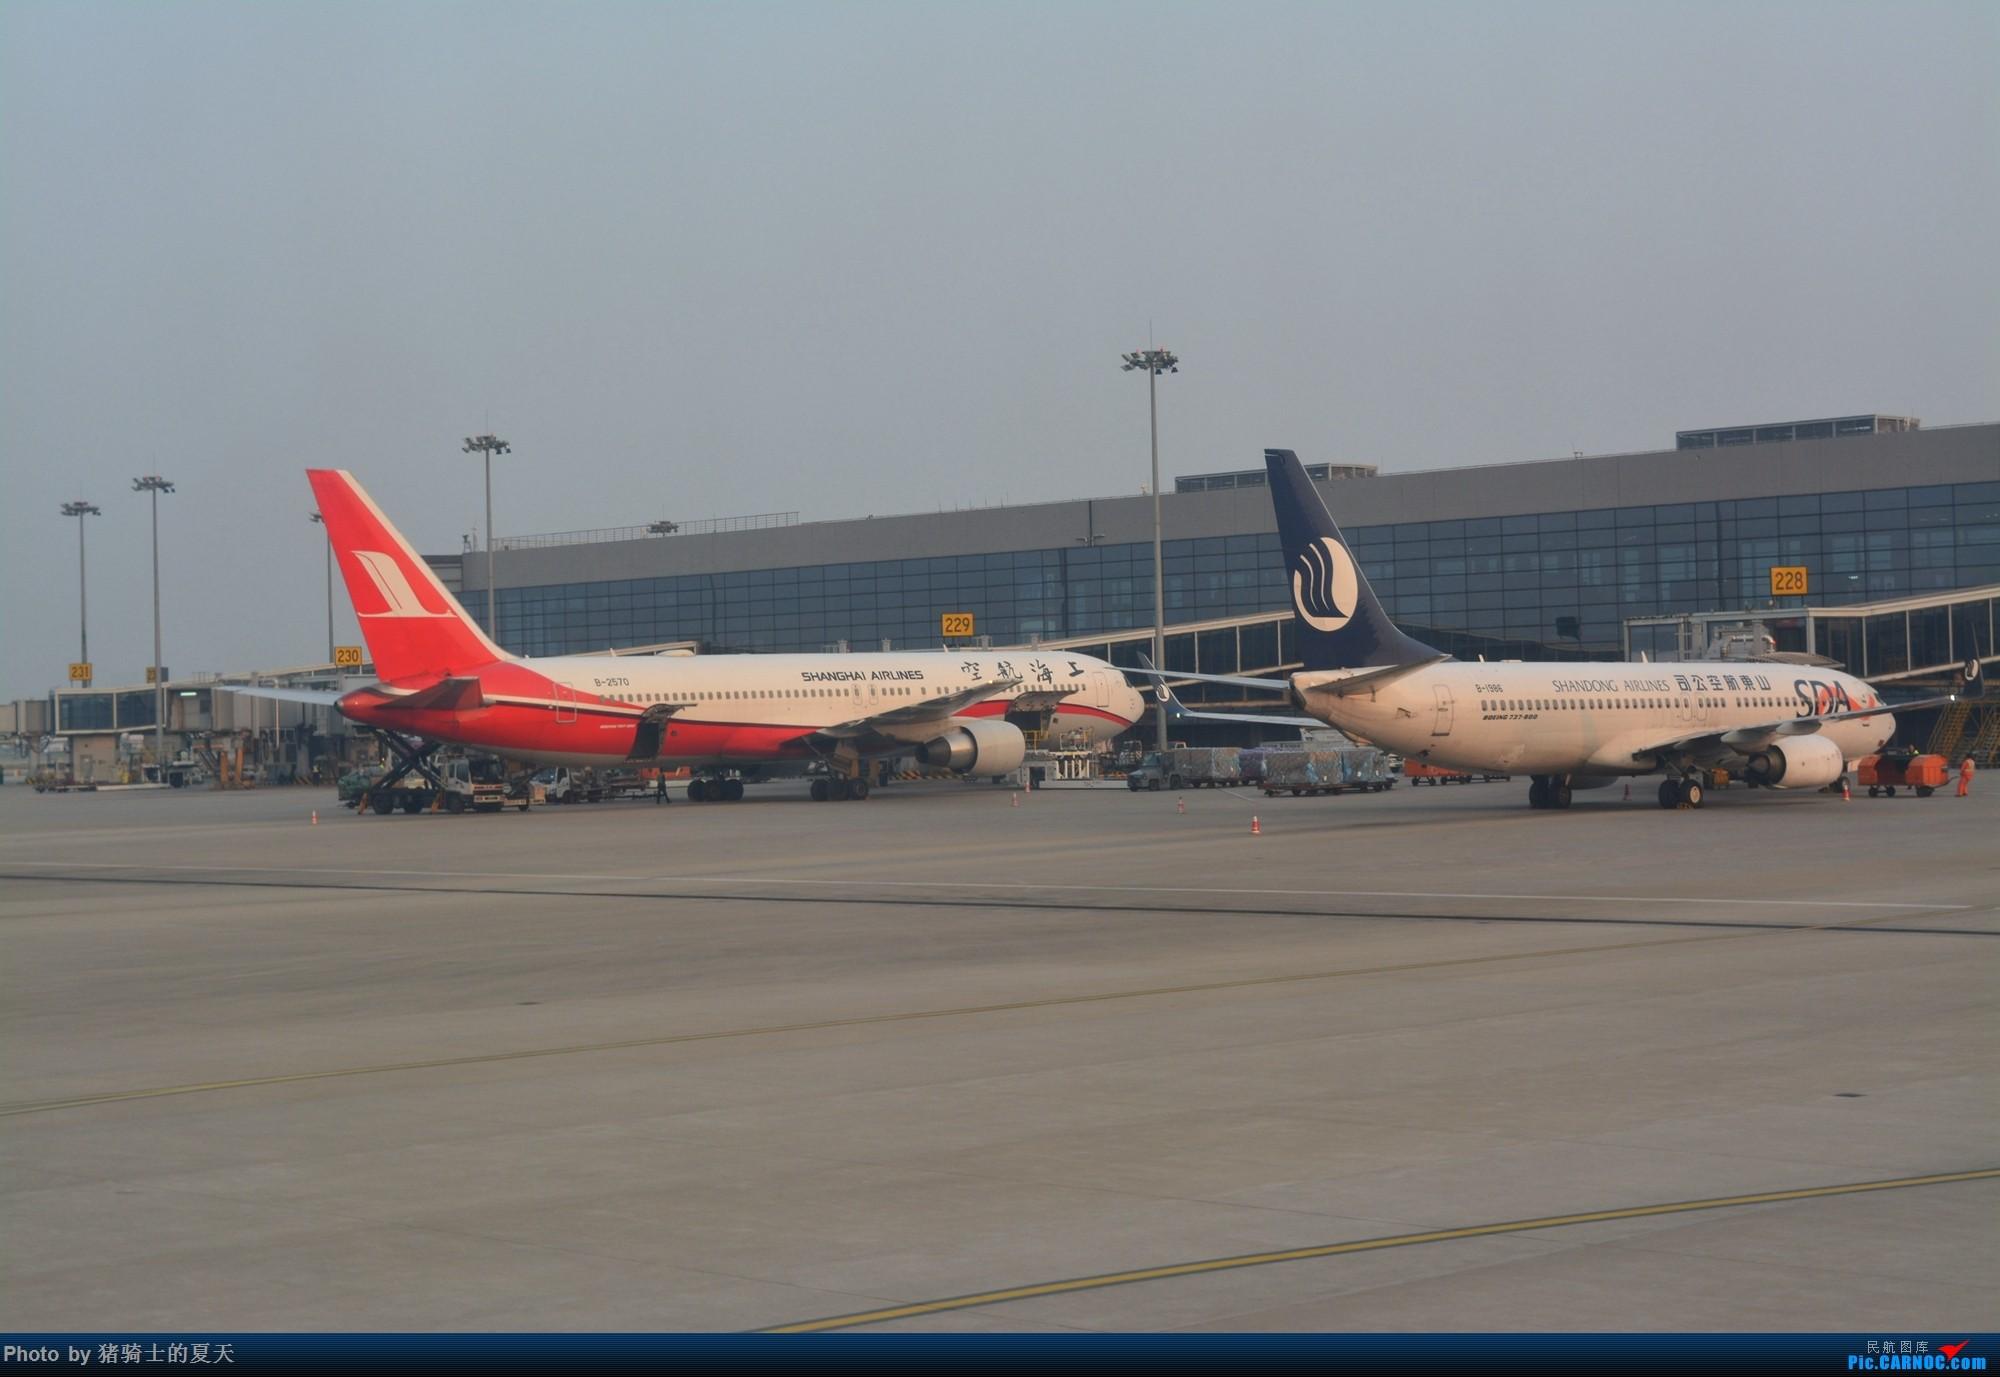 Re:[原创]2017年鸡鸭图 BOEING 767-300 B-2570 中国上海虹桥国际机场